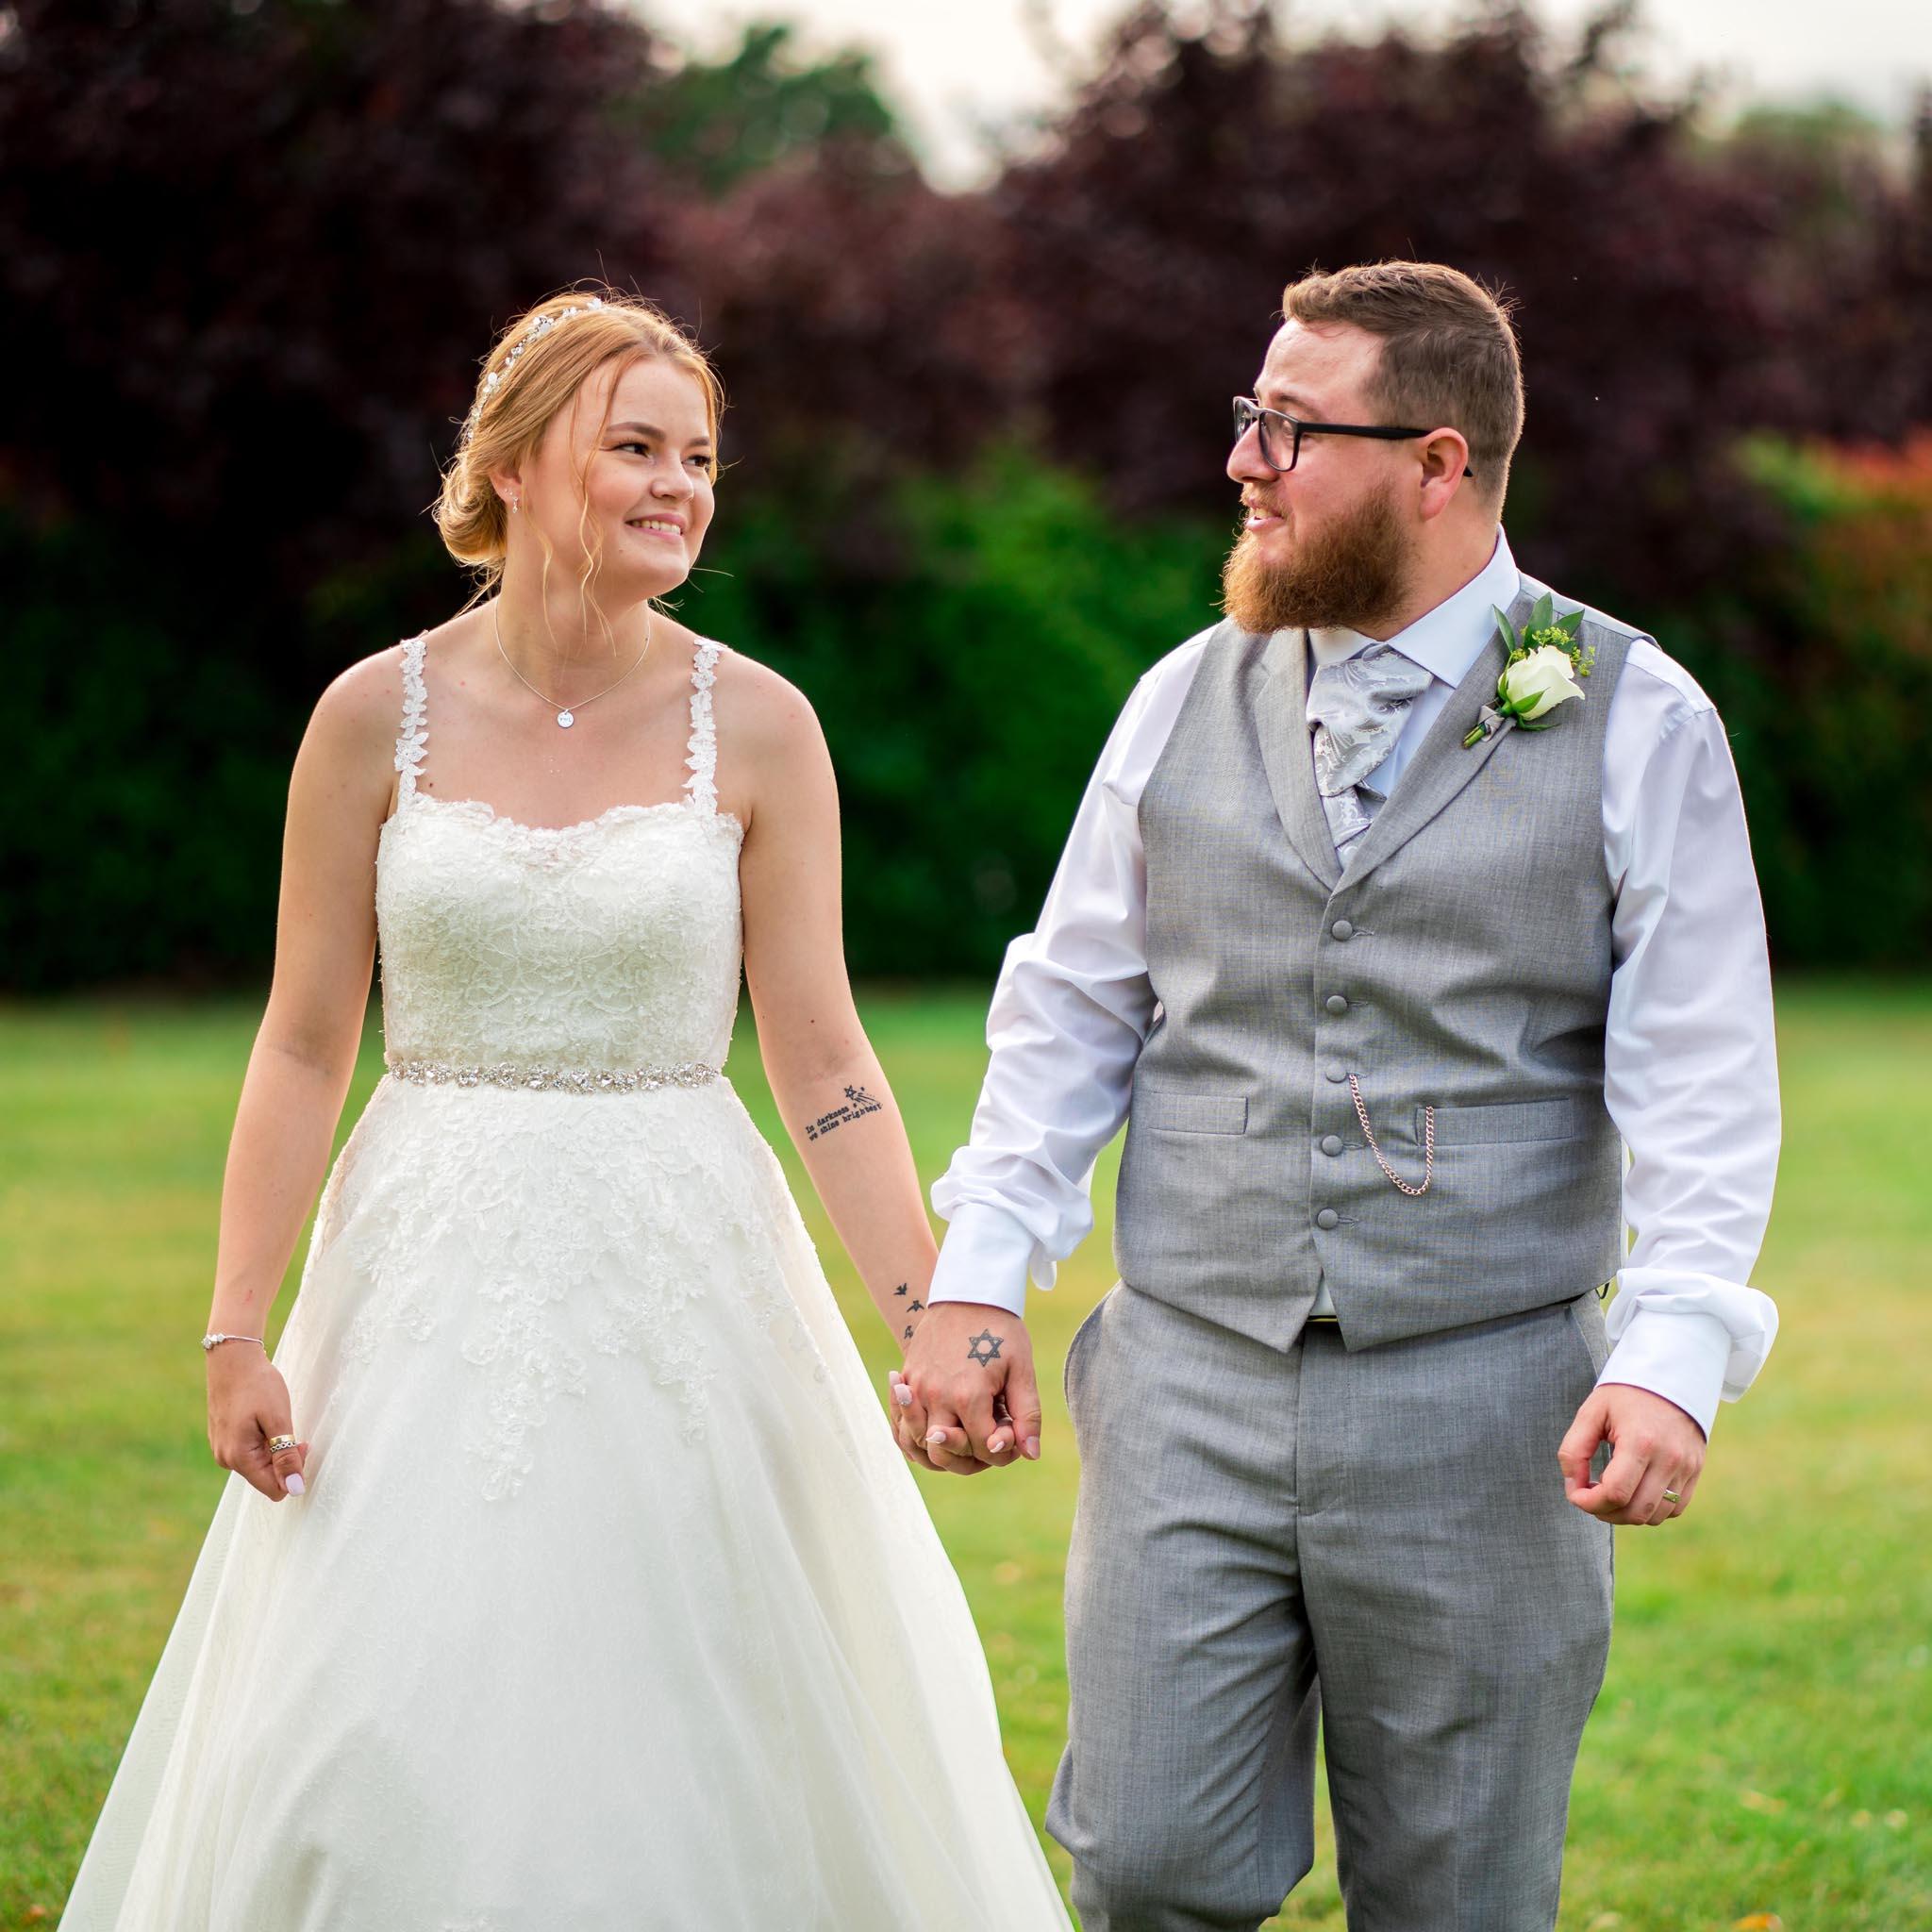 549-Bride-groom-Luke-Yasmin-The-Rayleigh-Club-Wedding-Photography.jpg